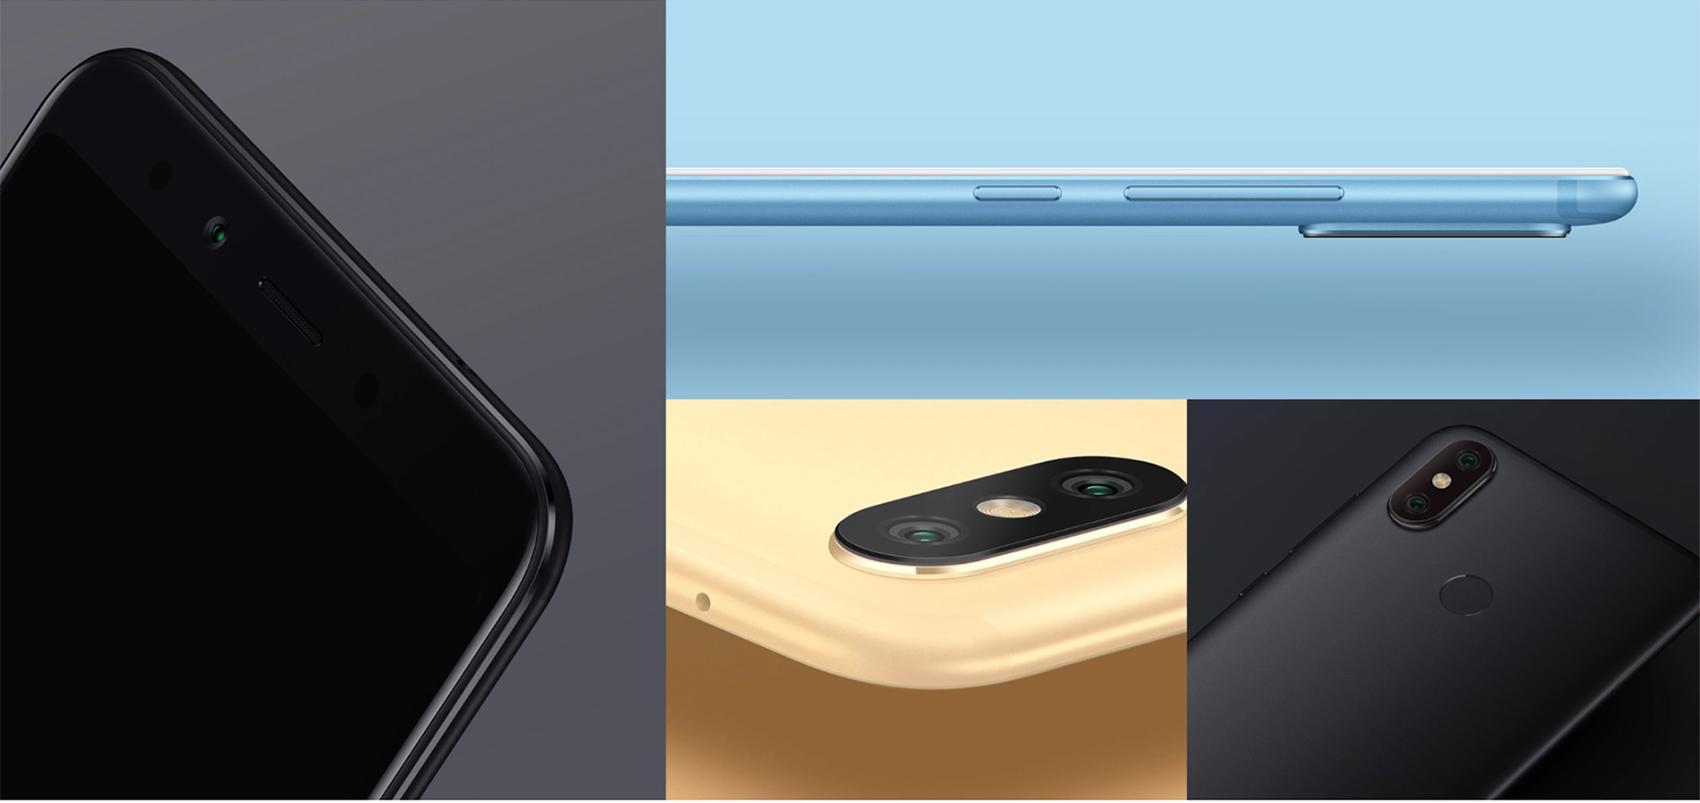 Điện thoại Xiaomi Mi A2 4GB+32GB